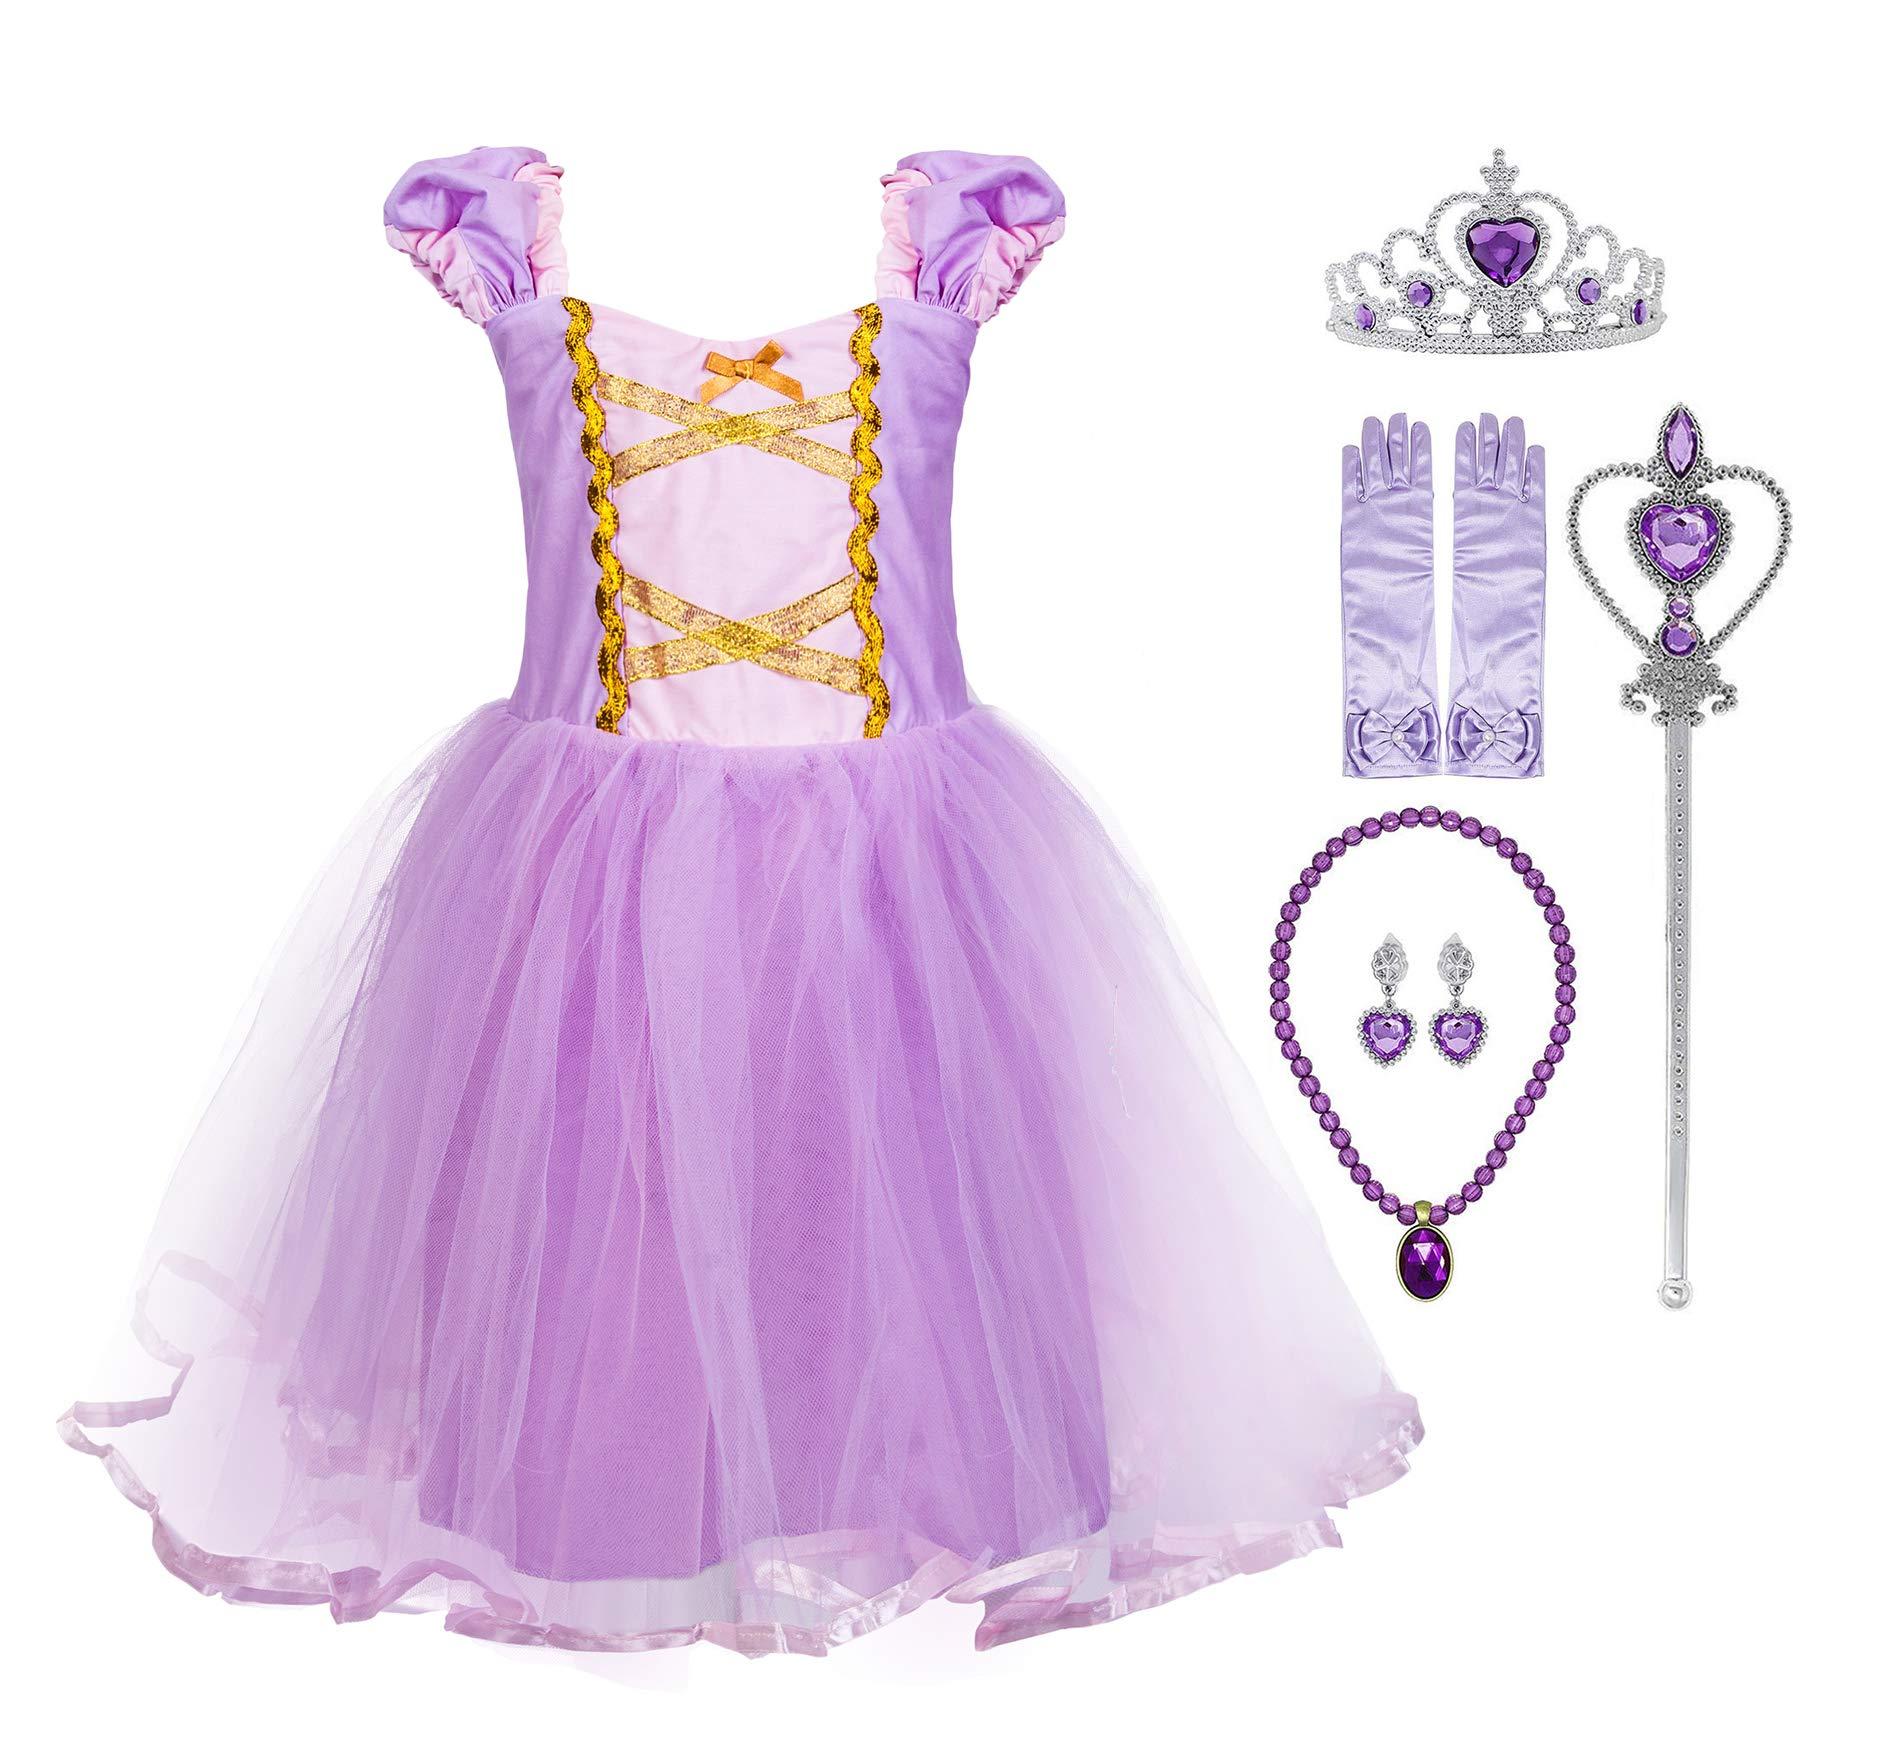 c51ca90f47f8 Princess Cinderella Rapunzel Little Mermaid Dress Costume for Baby Toddler  Girl product image